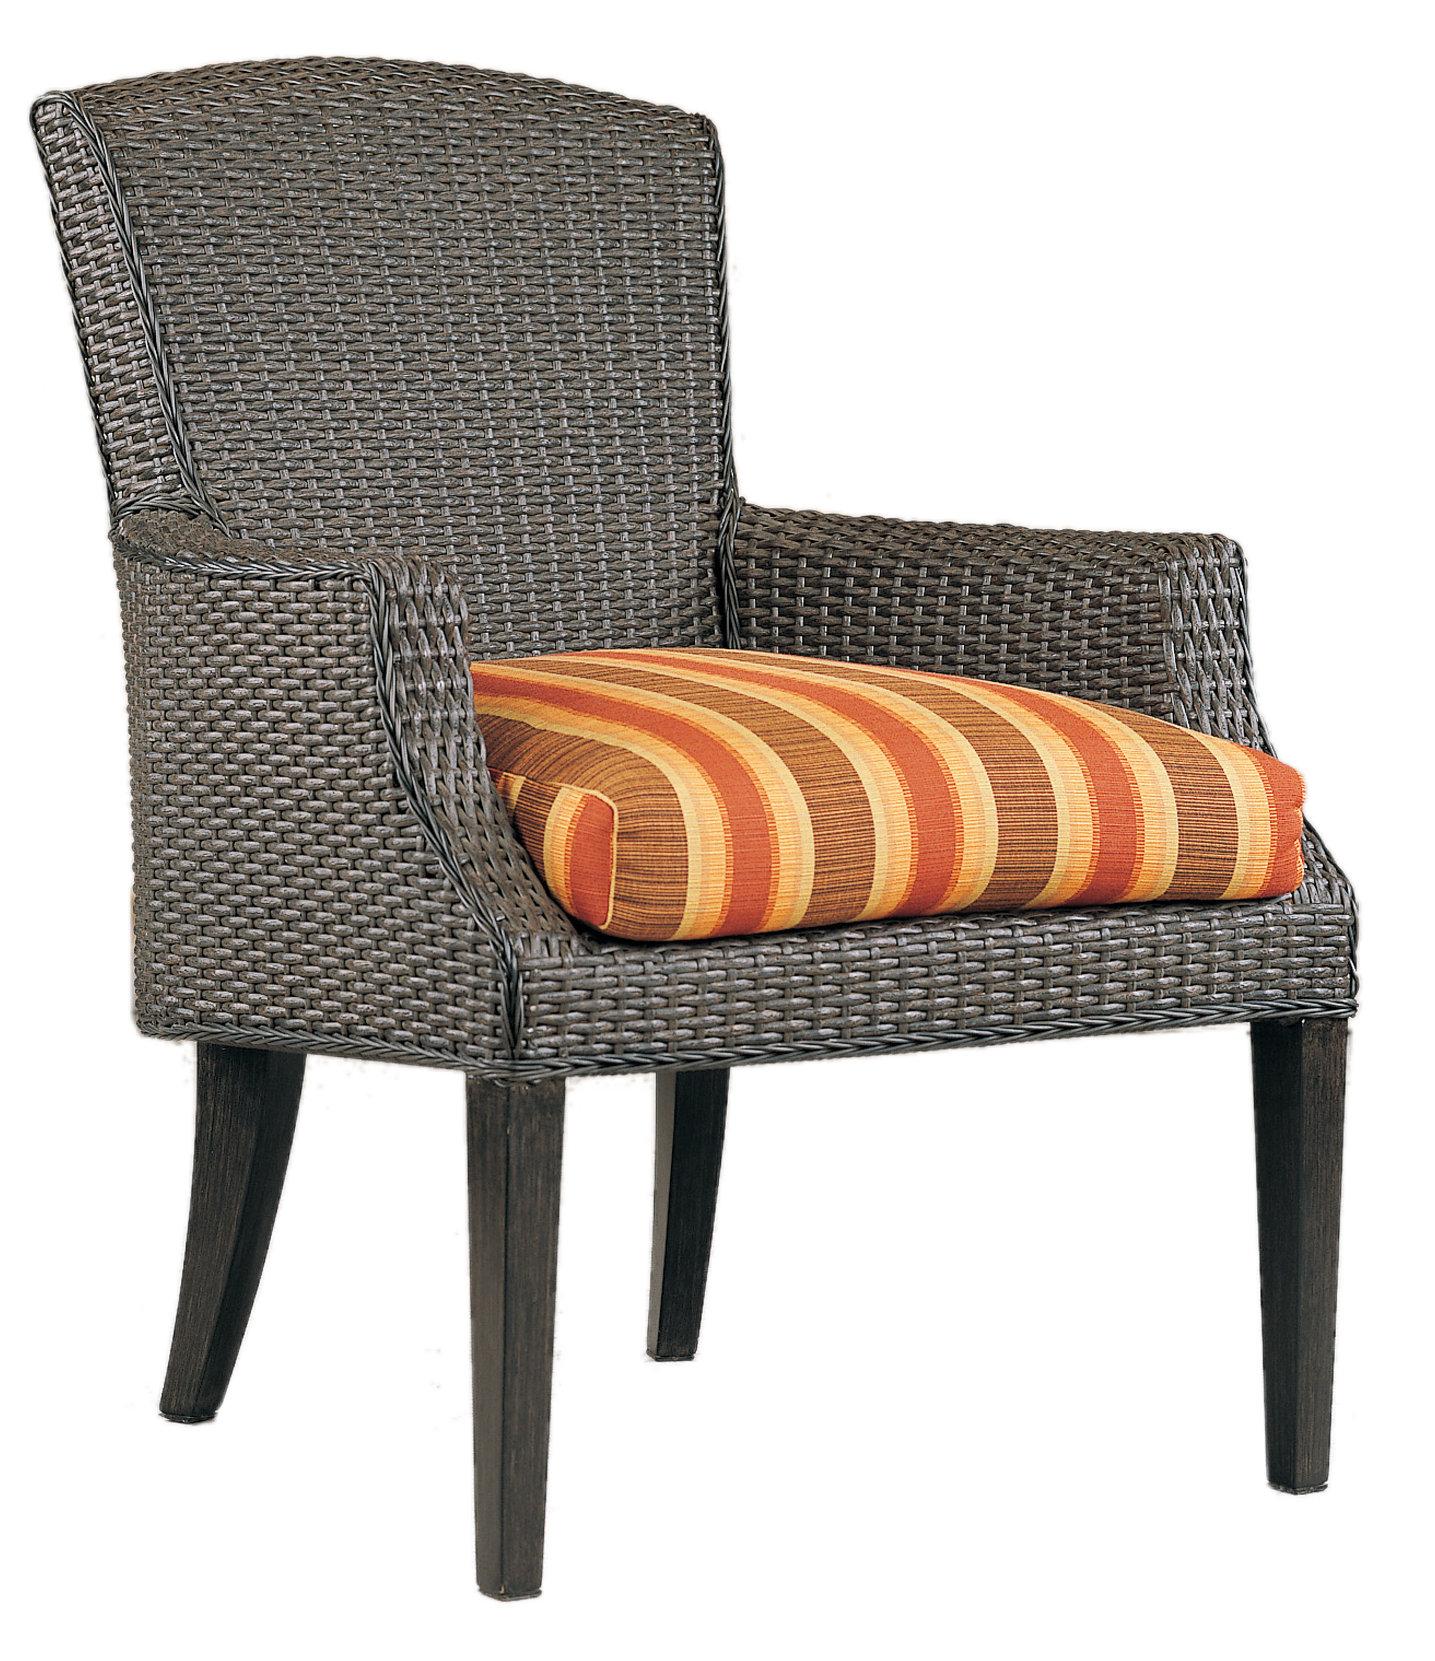 "970121 Monterey Dining Chair   26.3"" x 29.2"" x 36"""